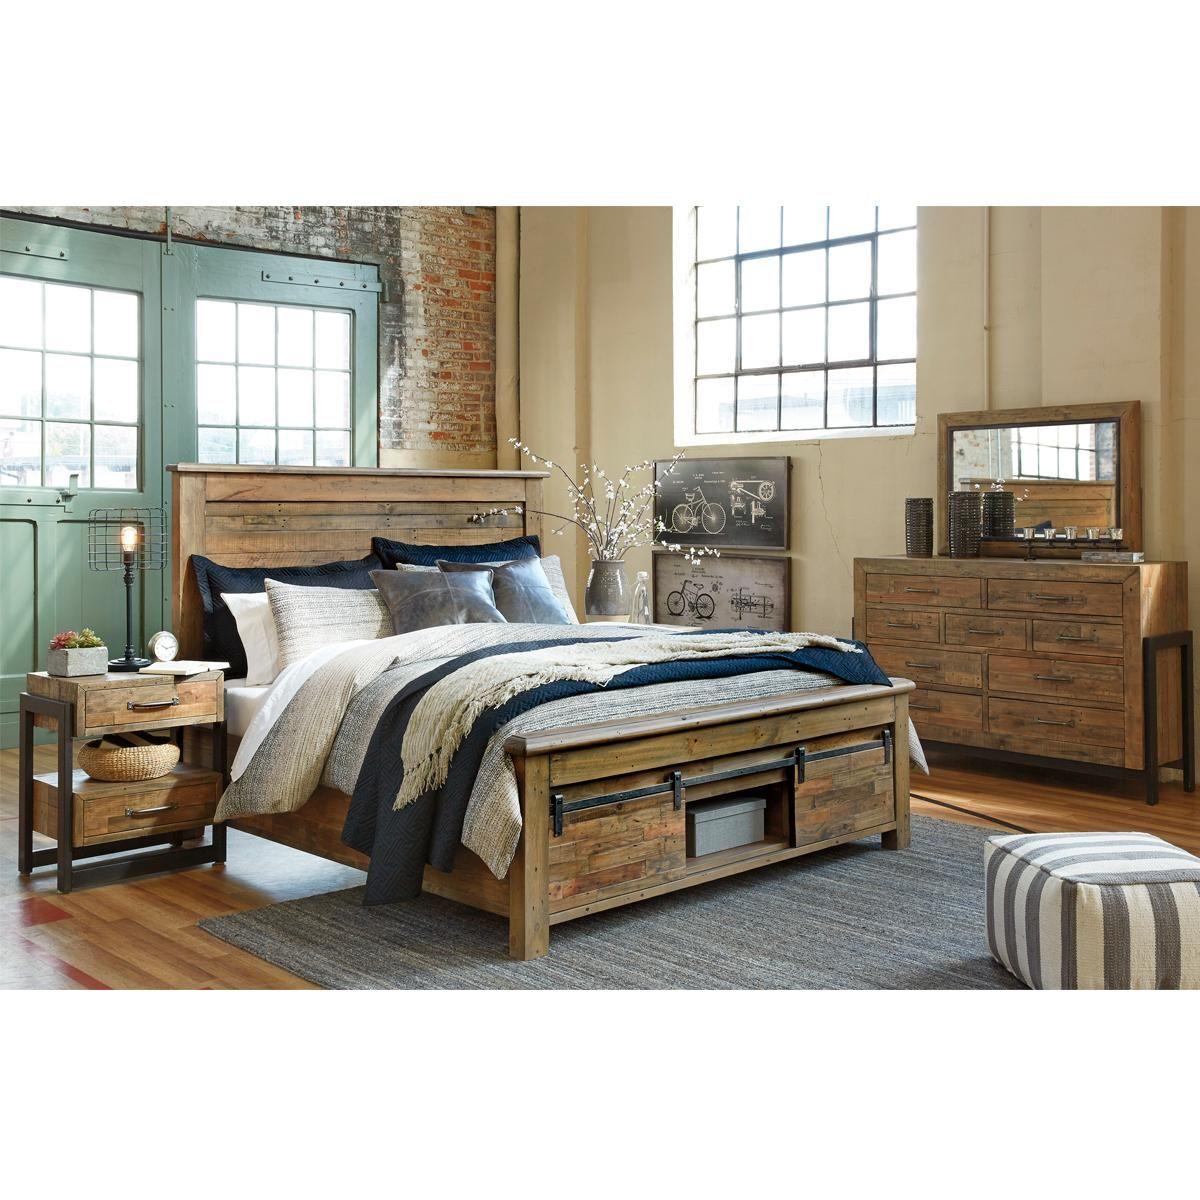 Best Arcadia Lane Sommerford 4 Piece King Bedroom Set In Light Greyish Brown Bedroom Furniture Sets 400 x 300